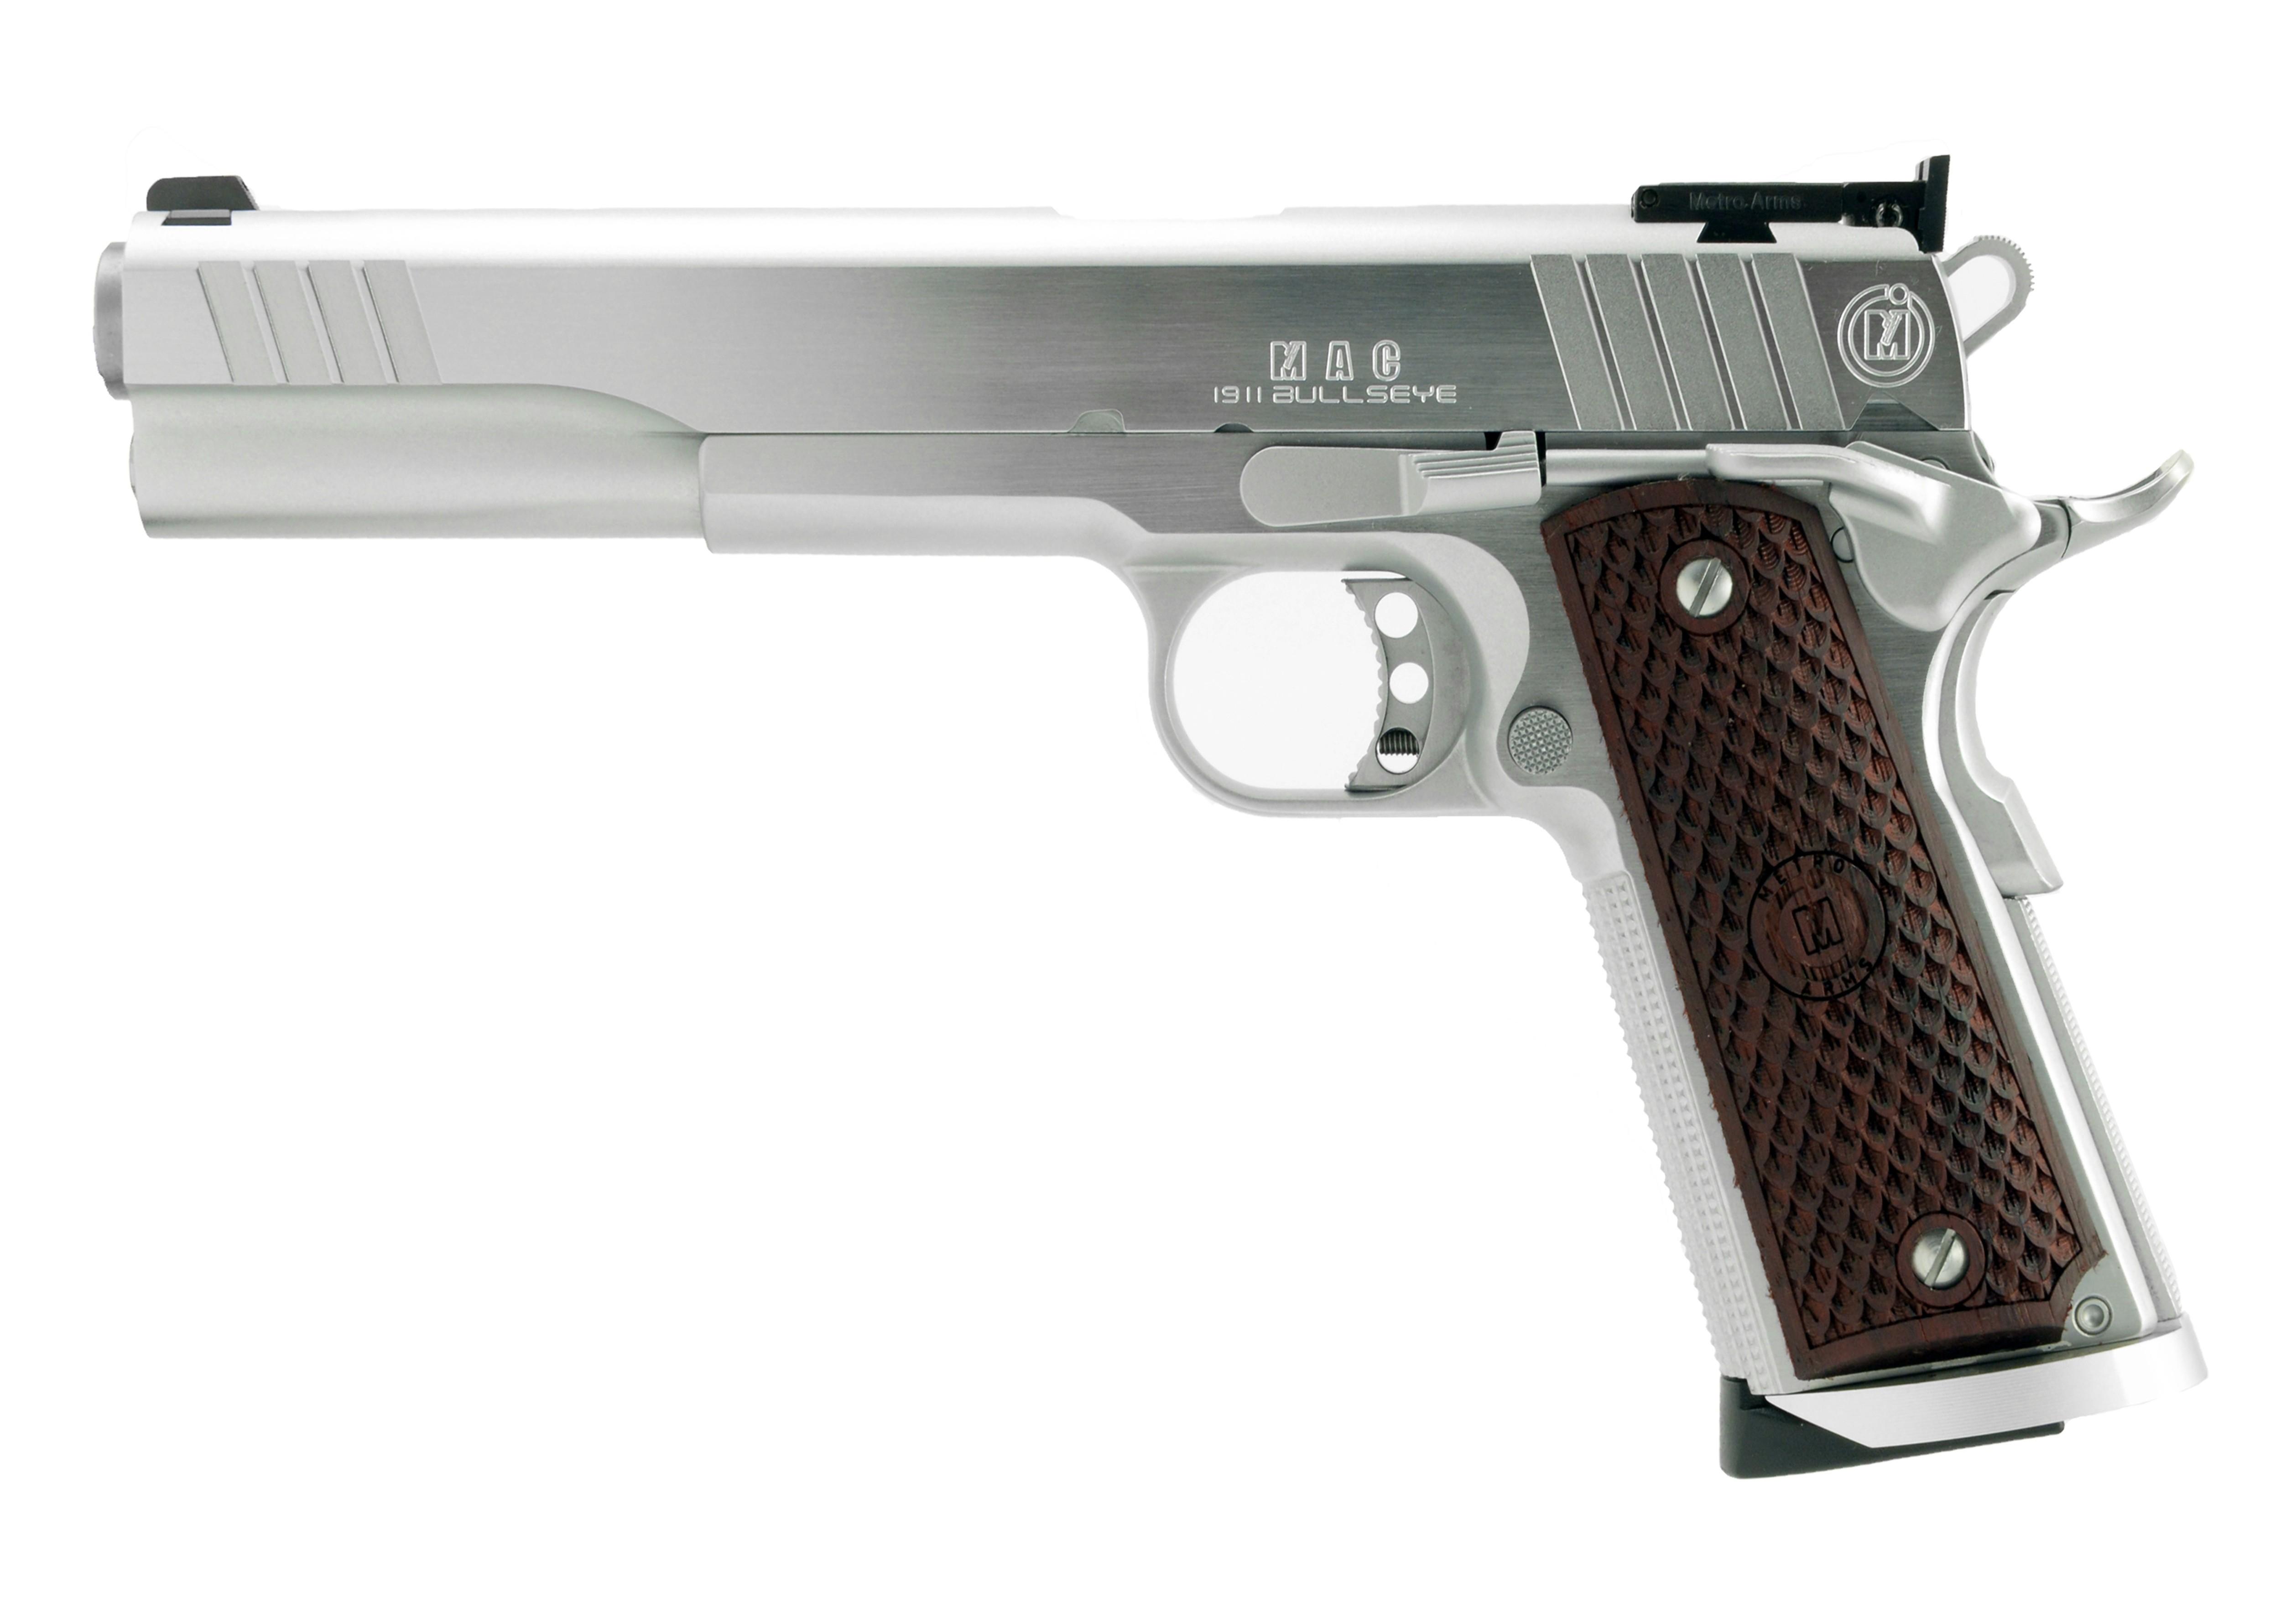 American Classic 1911 Bullseye 45 ACP